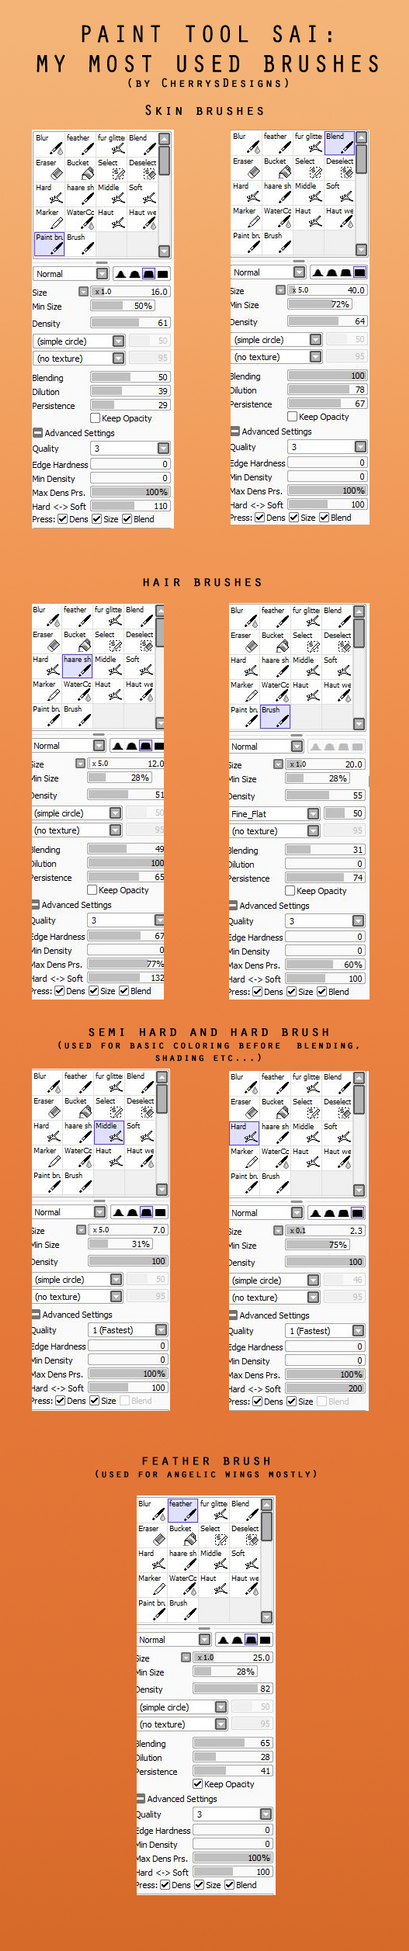 My Paint tool SAI brush settings (Most used) by CherrysDesigns